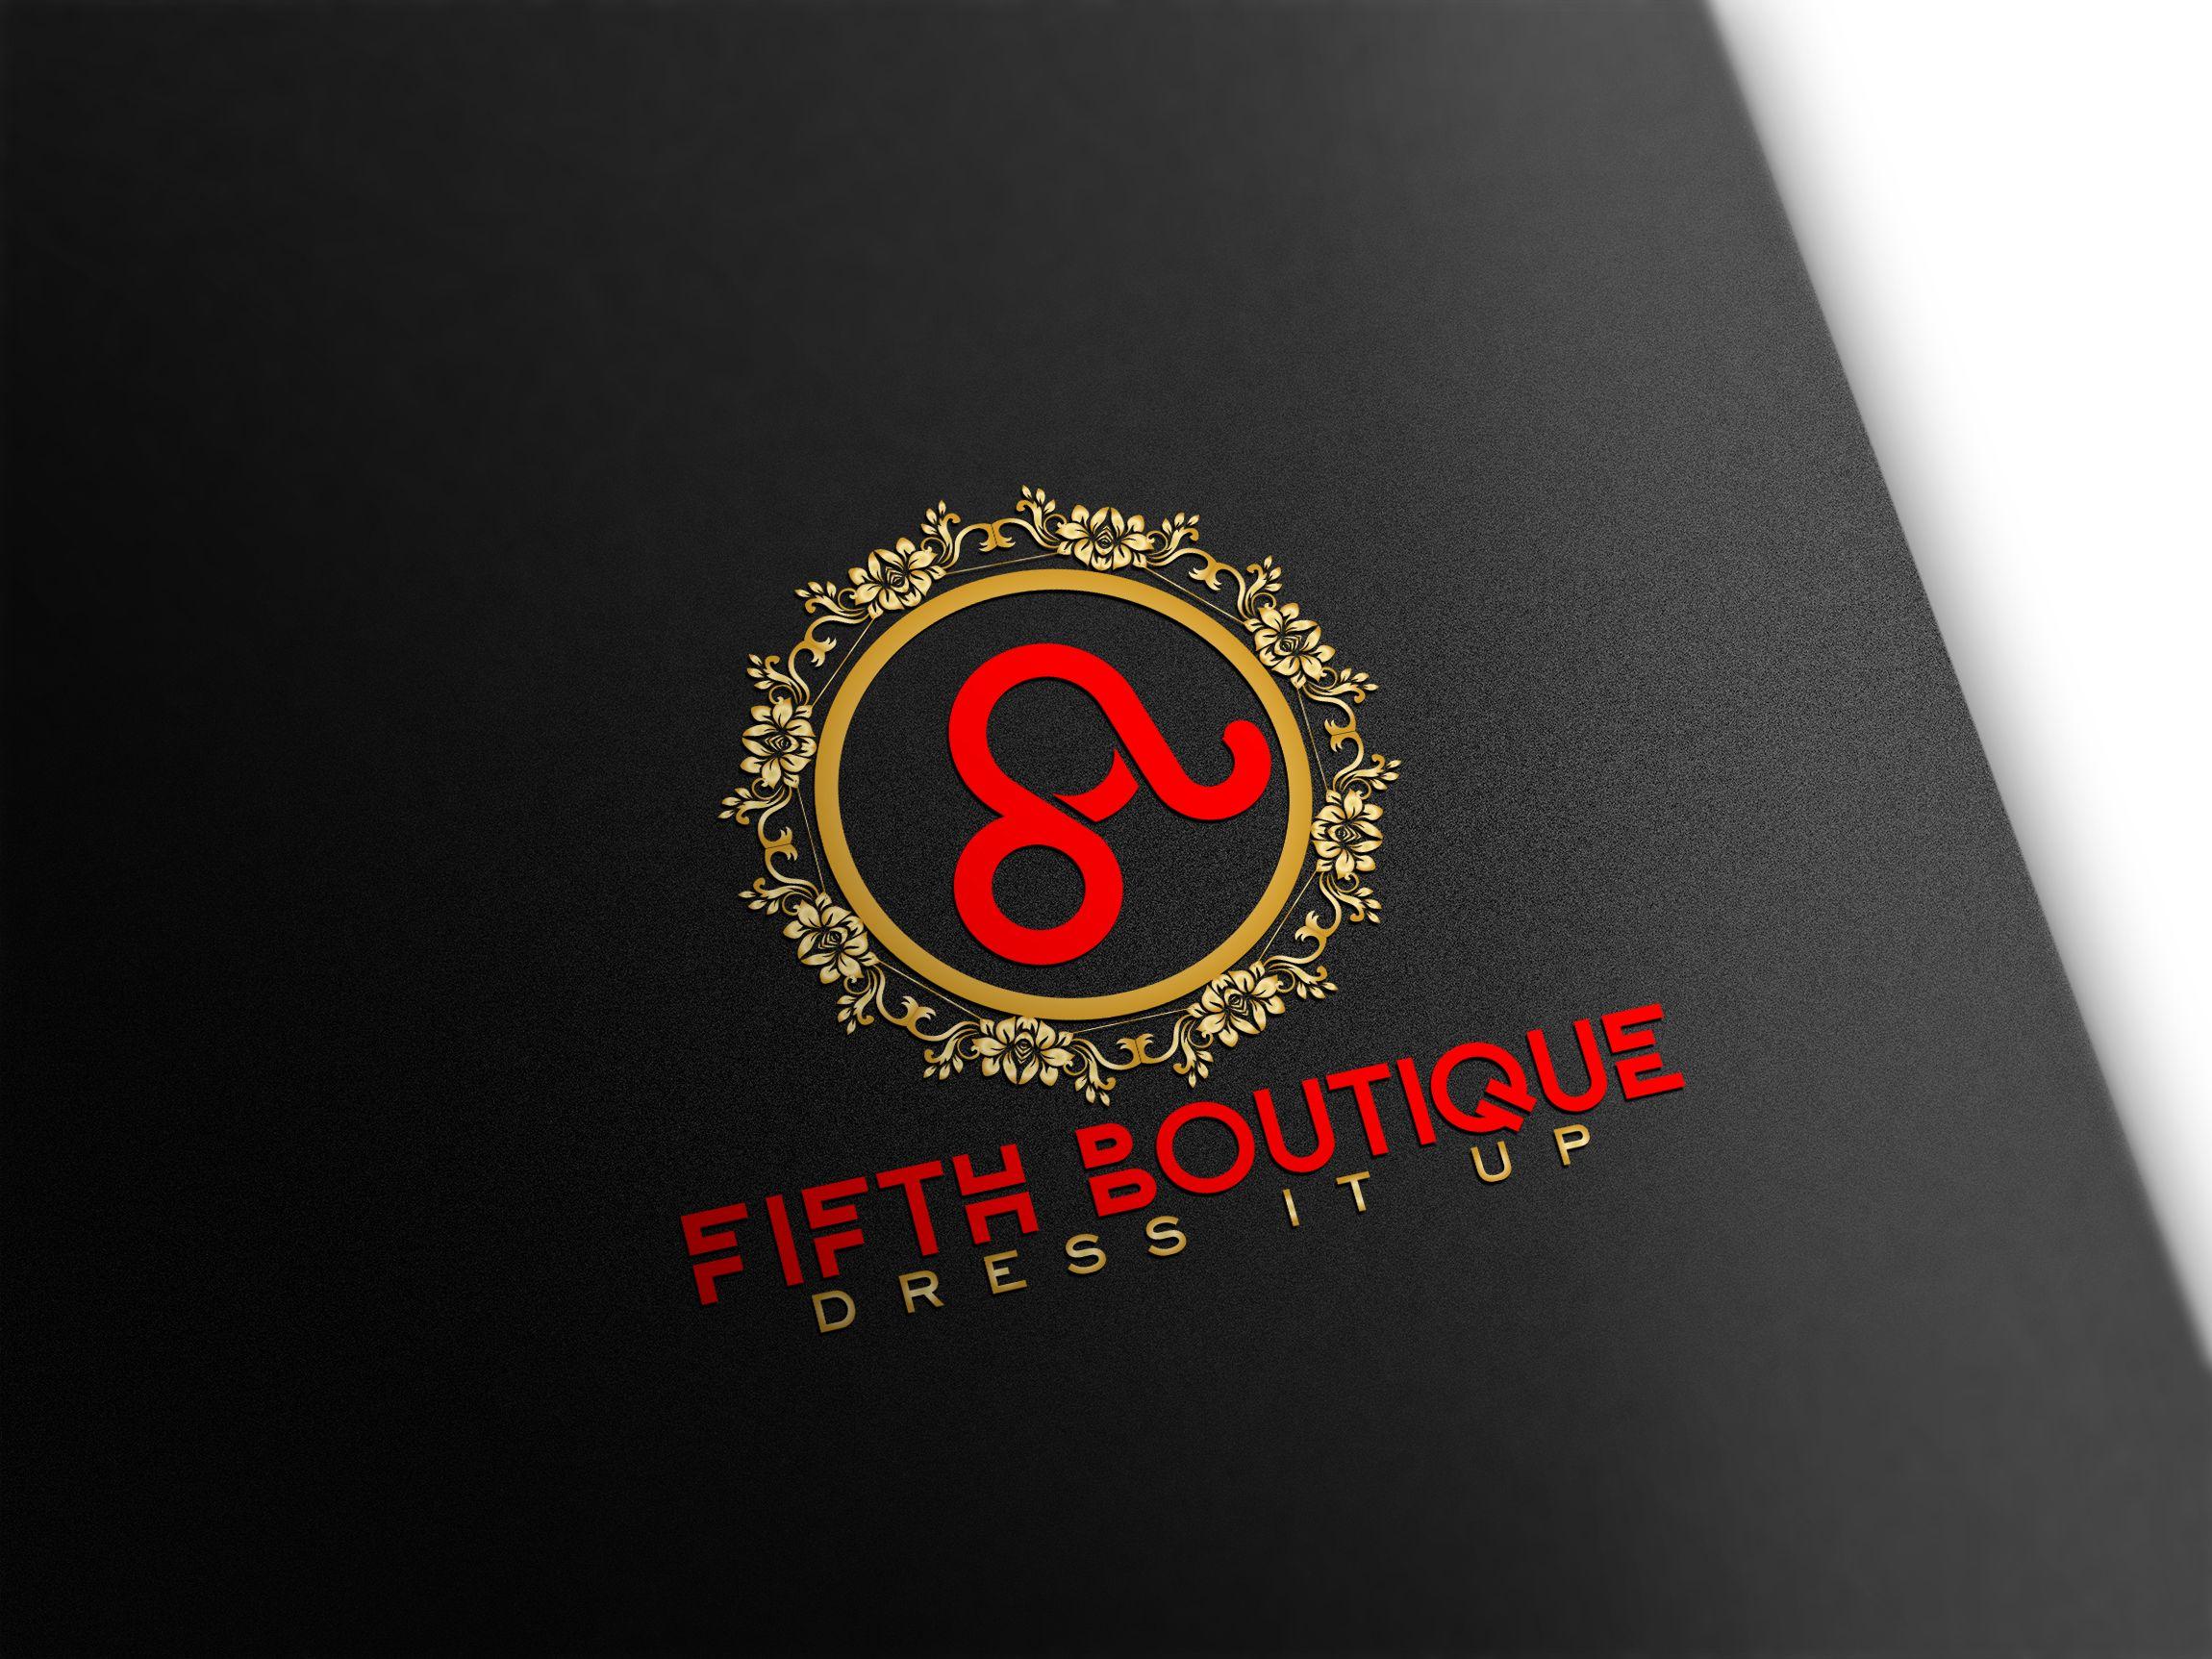 #newdesigns786 #fiverr # madeonfiverr #logodesigns #logodesignsbyisabela #LogoDesignSpecialist #logo #logomaker #logodesigner #logomaking #gaming #gaminglogo #gaminglogomaker #gamer #pubgmobile #pubg #photoshop #art #wallpaper #workfromhome #love #maharashtra #mumbai #navimumbai #logotype #logodesinger #logoconcept #logoinspire #logopedia #logosai #logodaily #logobrand #logomark